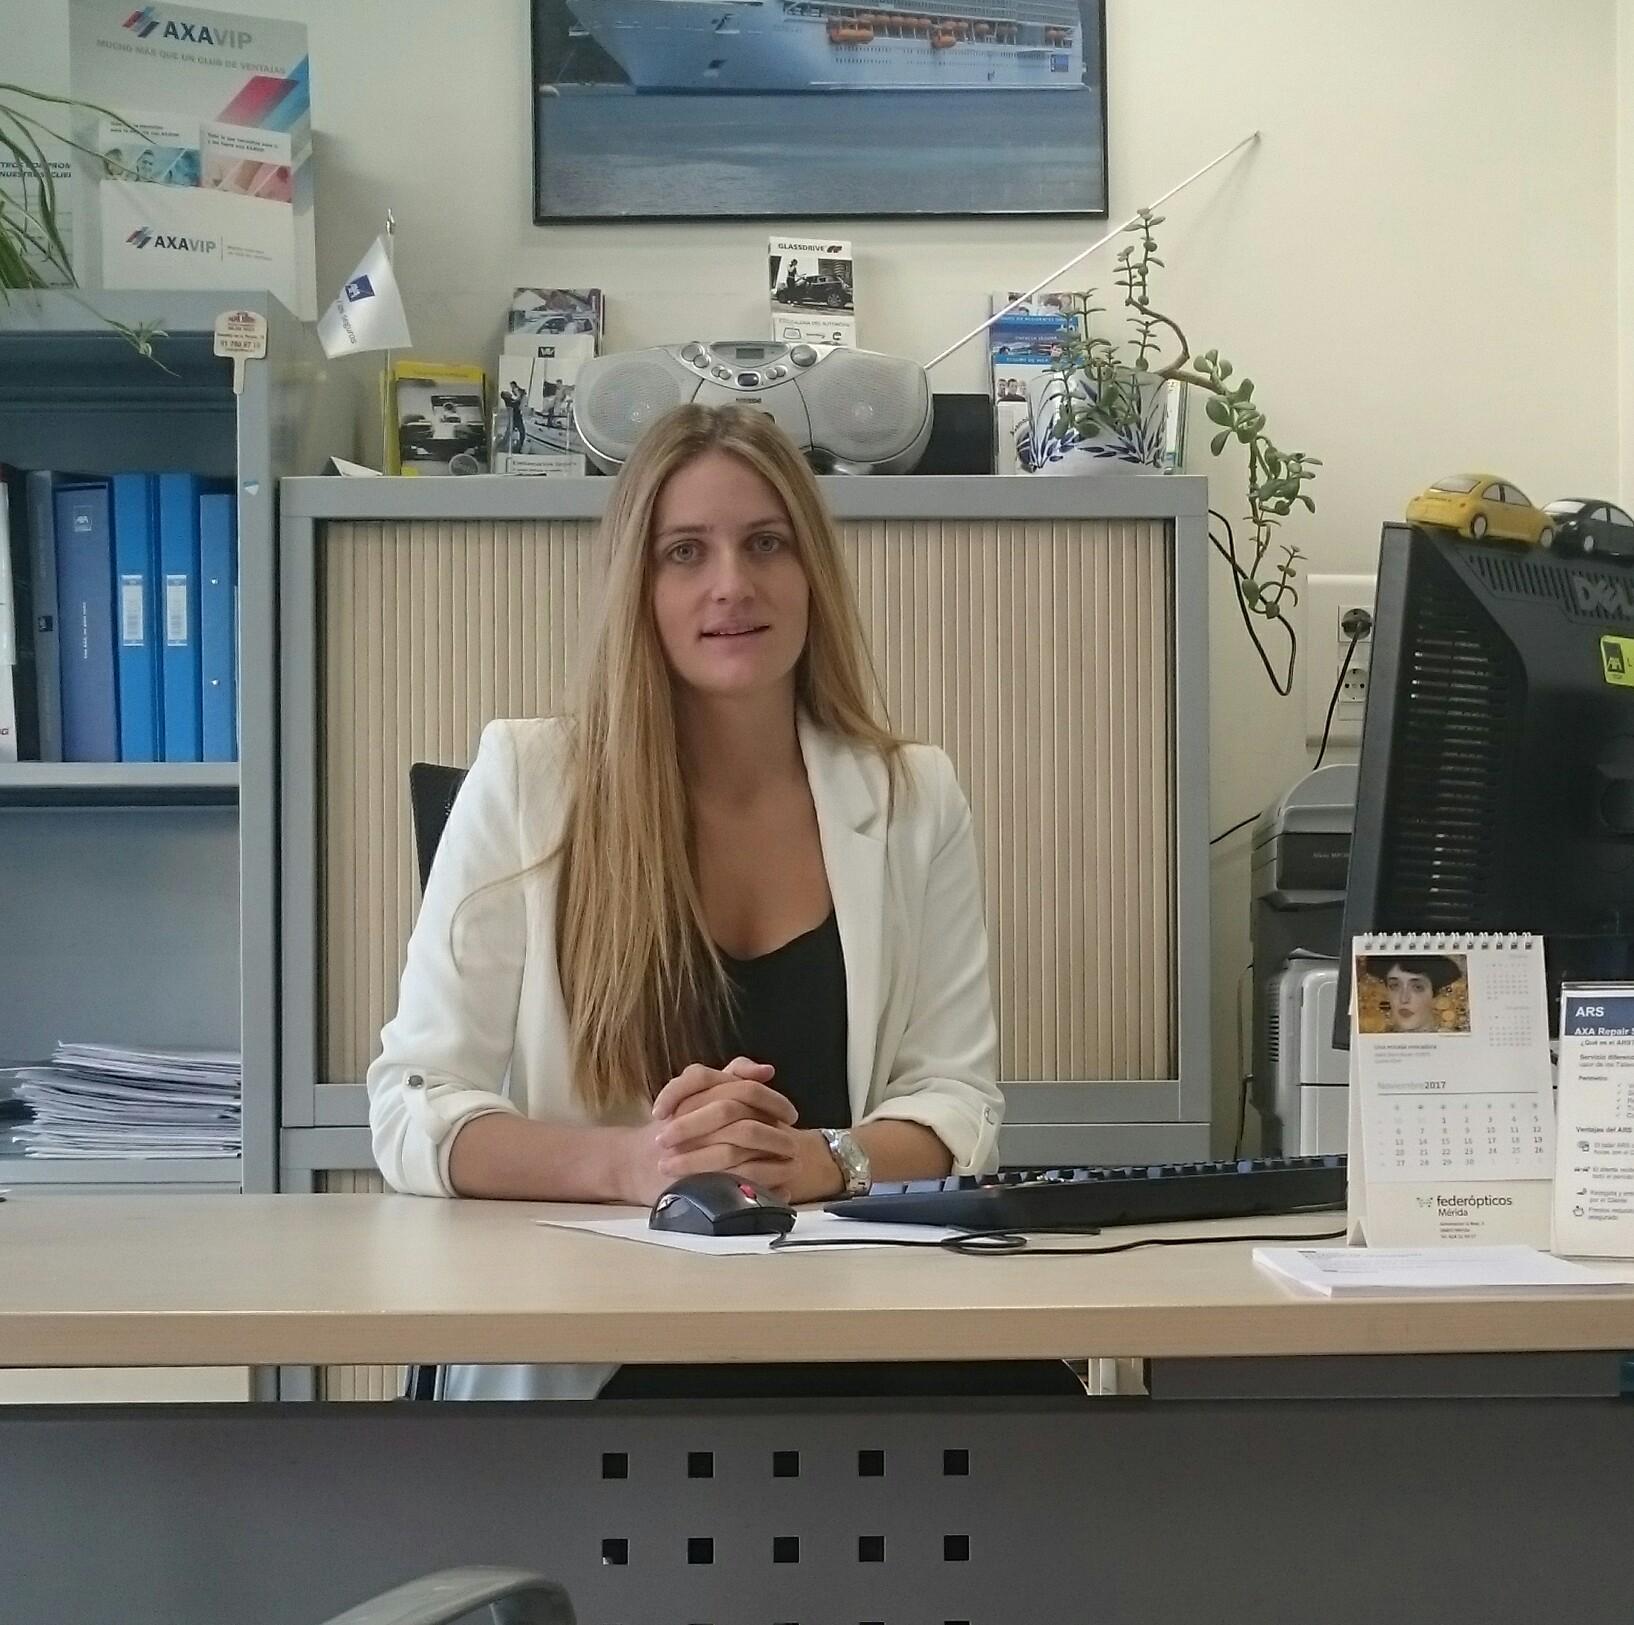 Oficina seguros axa jadrasegur s l madrid madrid for Axa oficinas centrales madrid